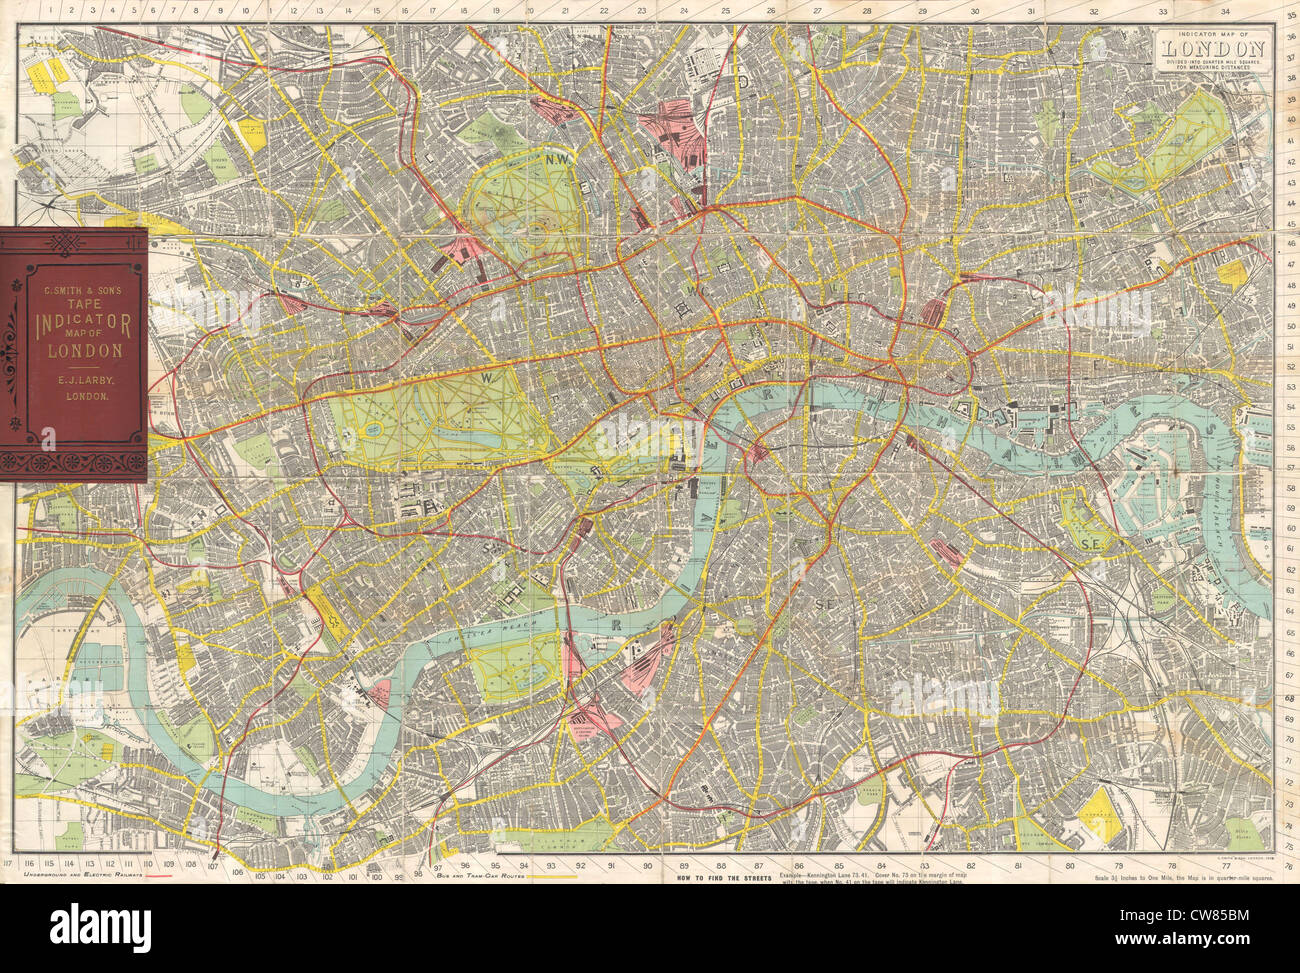 1910 Smith's Tape Indicator Map of London ( Pocket Map ) - Stock Image